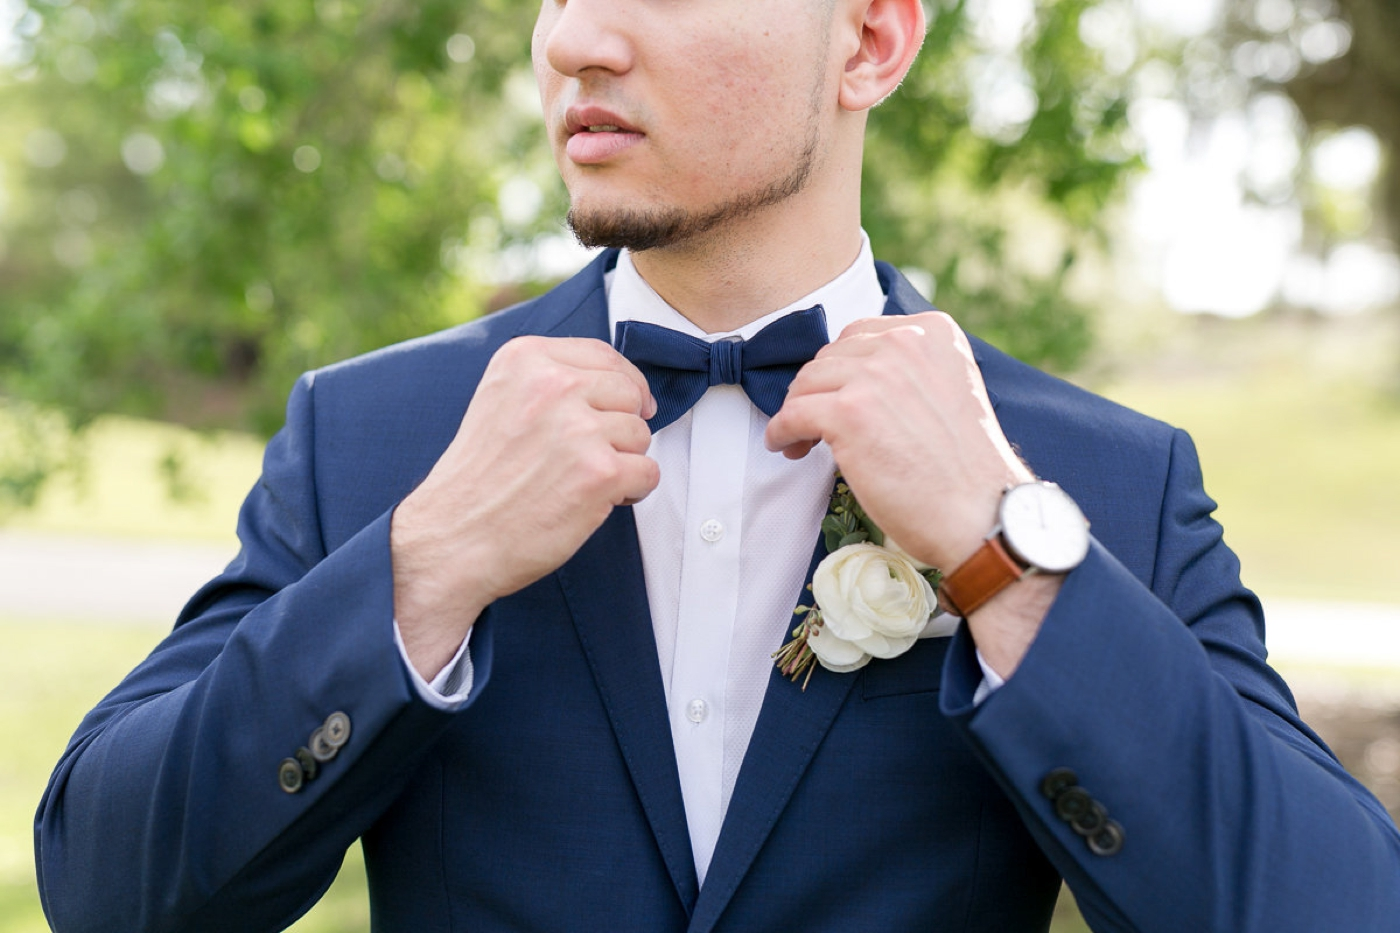 navy blue tuxedo and bowtie